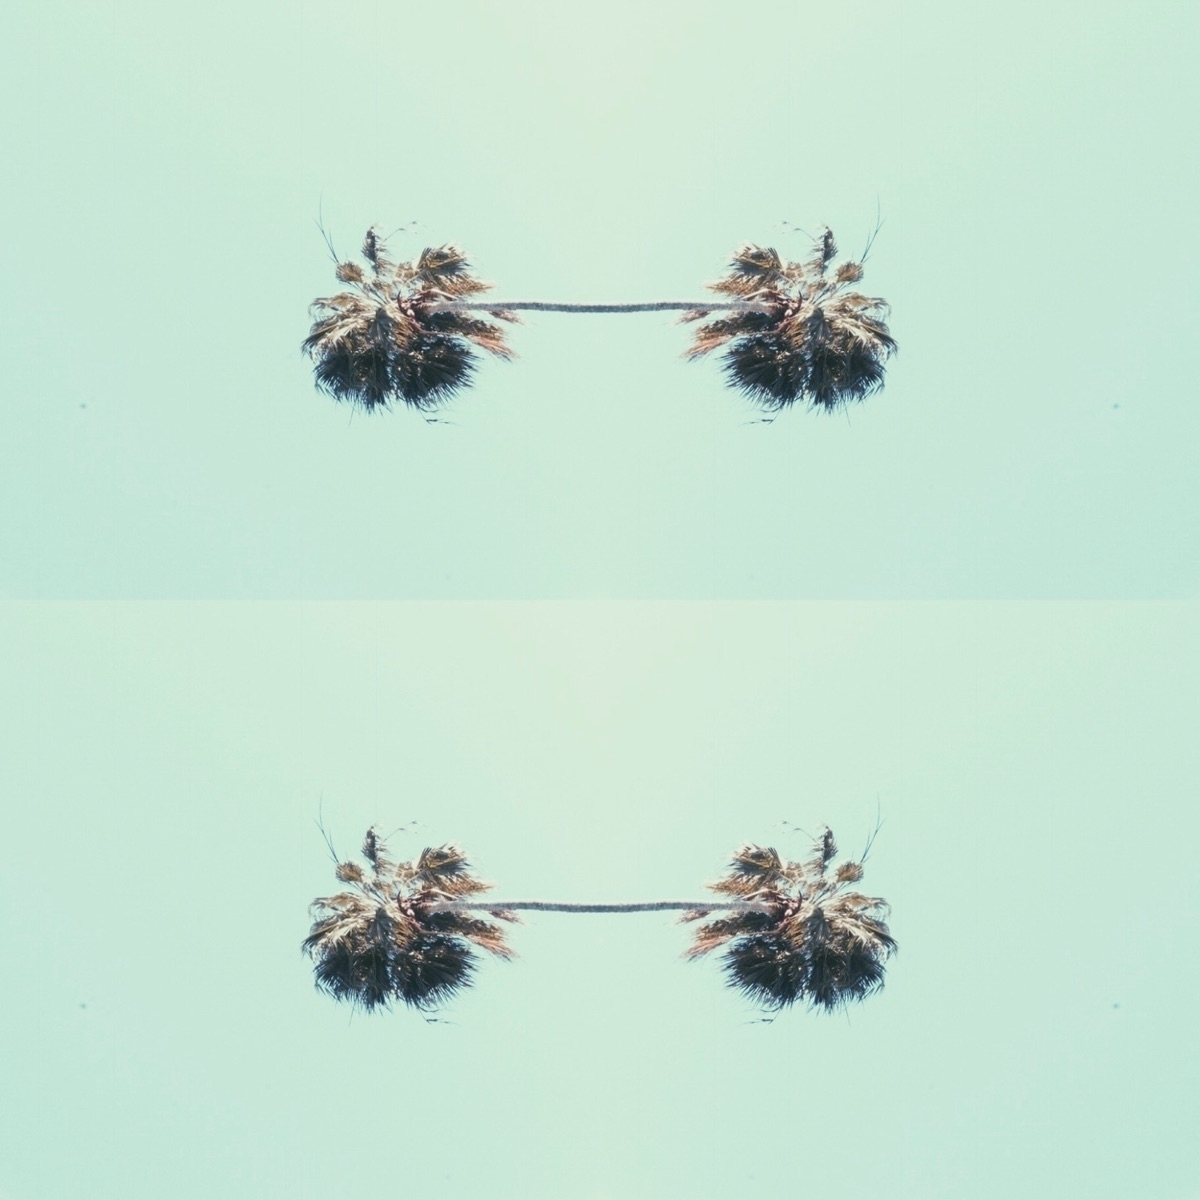 Palm tree earrings concept - design - spacesbeats   ello